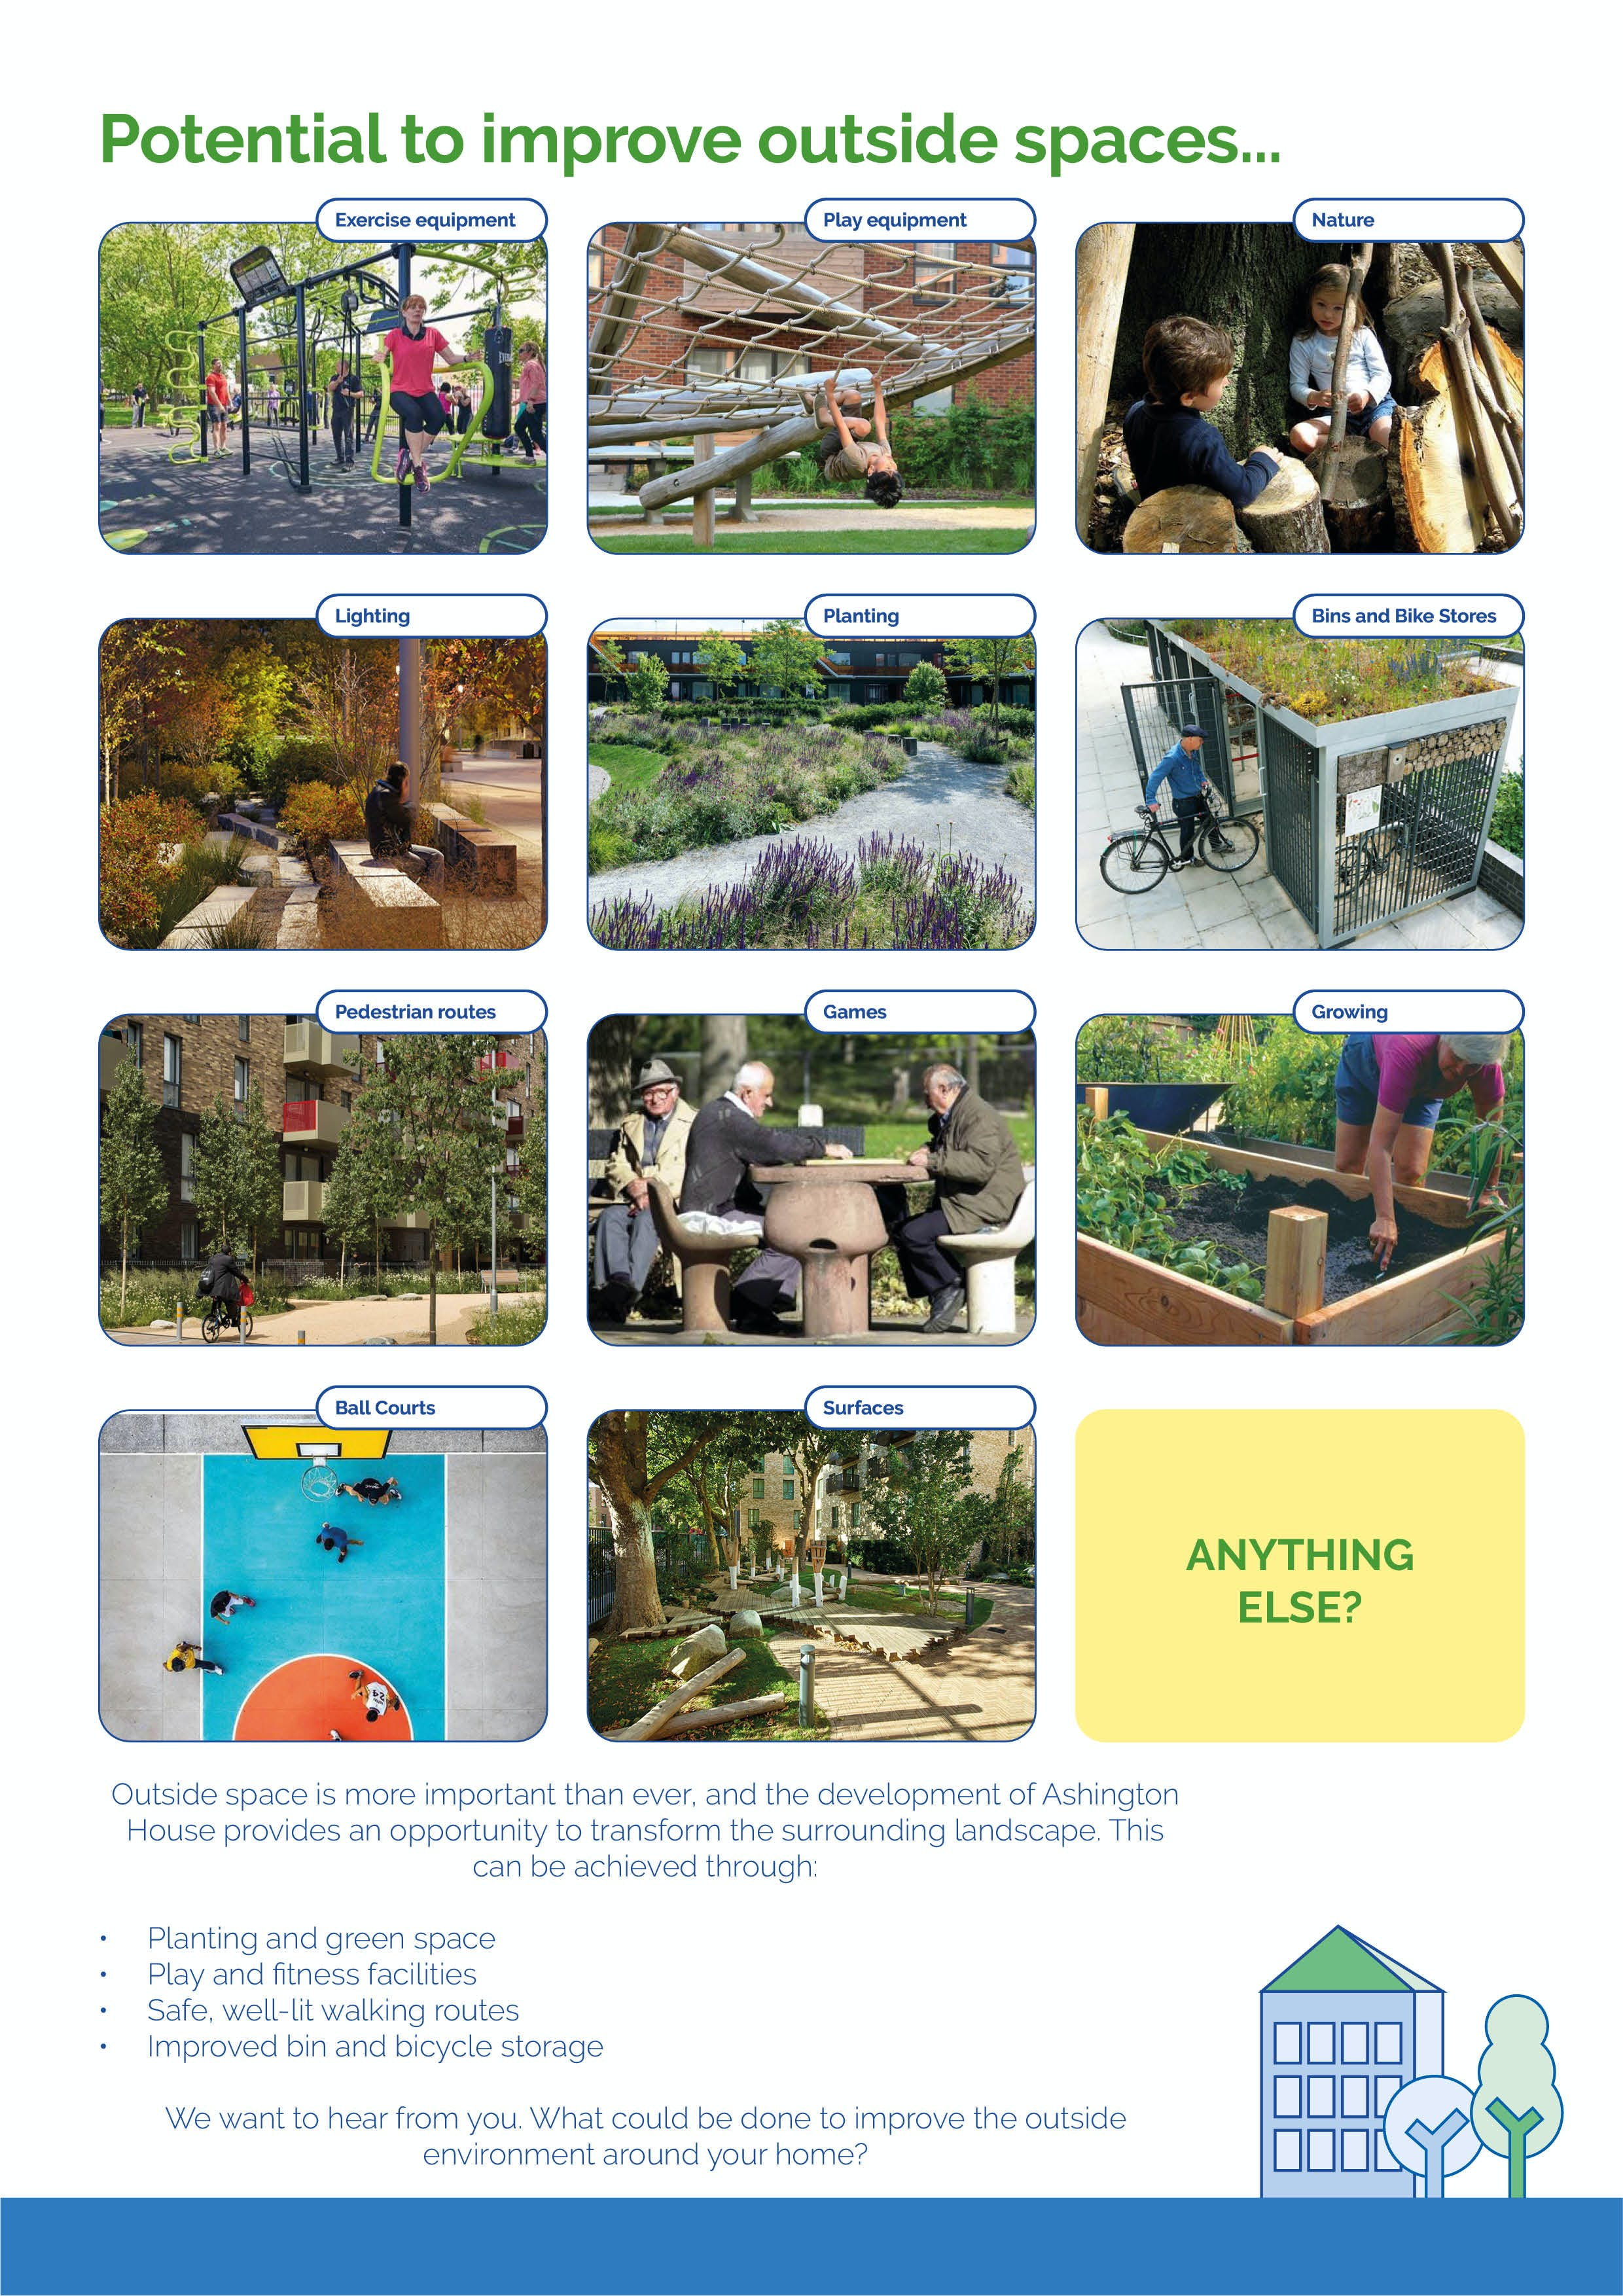 2020-12-09 Consultation Leaflet_Page 03.jpg